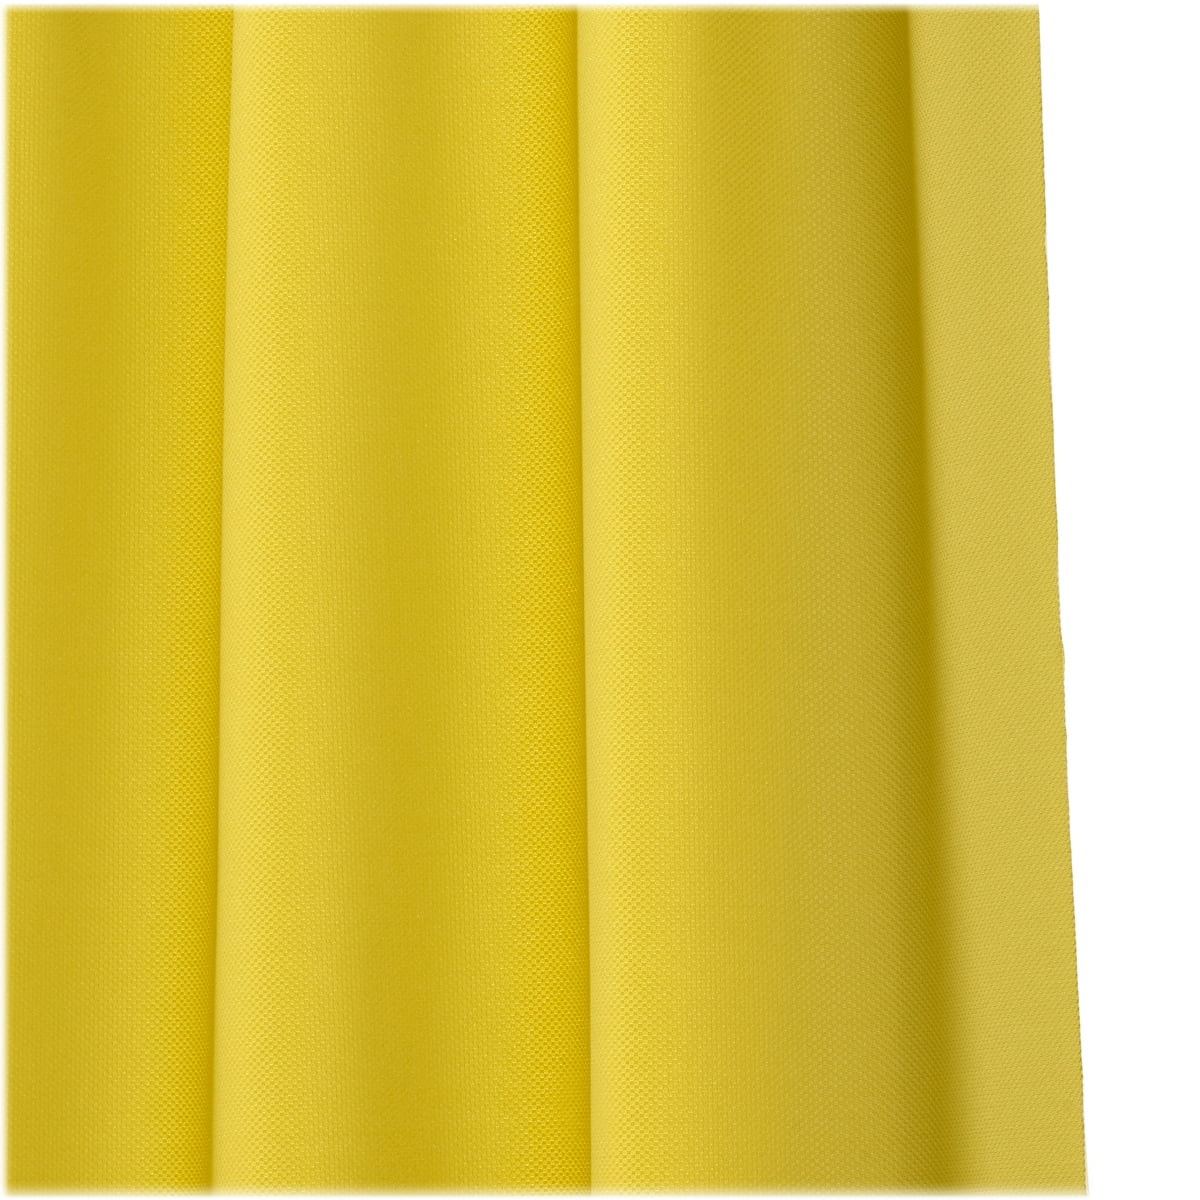 Kvadrat - Rideau Ready Made Curtain 200 x 290 cm, Ace 442